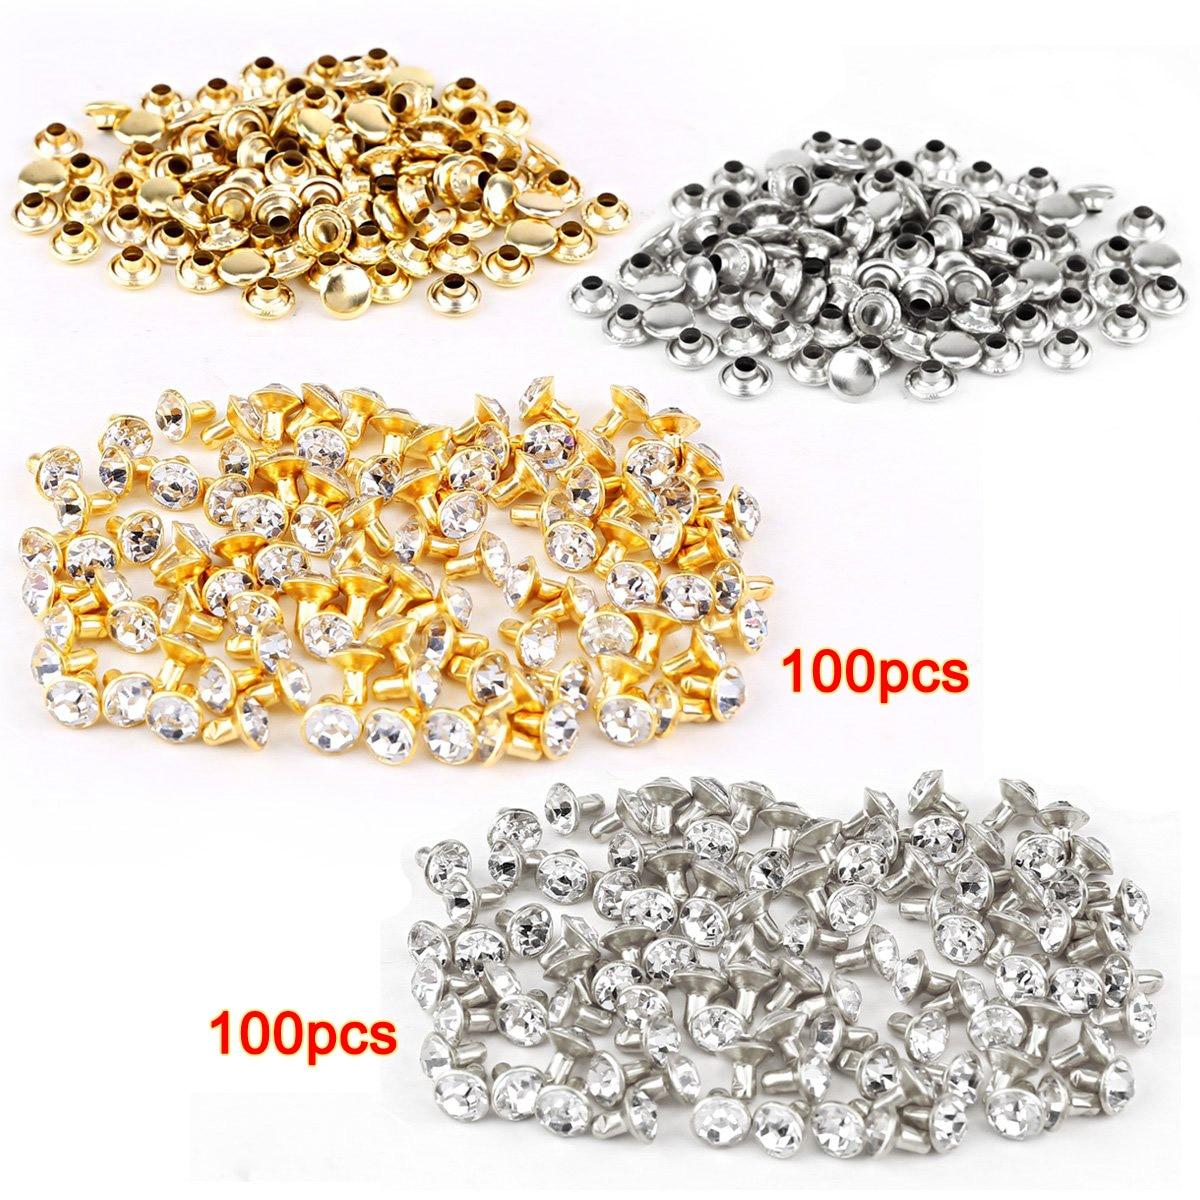 LHLL 100 шт серебро + 100 шт золотая заклепка со стразами 7 мм